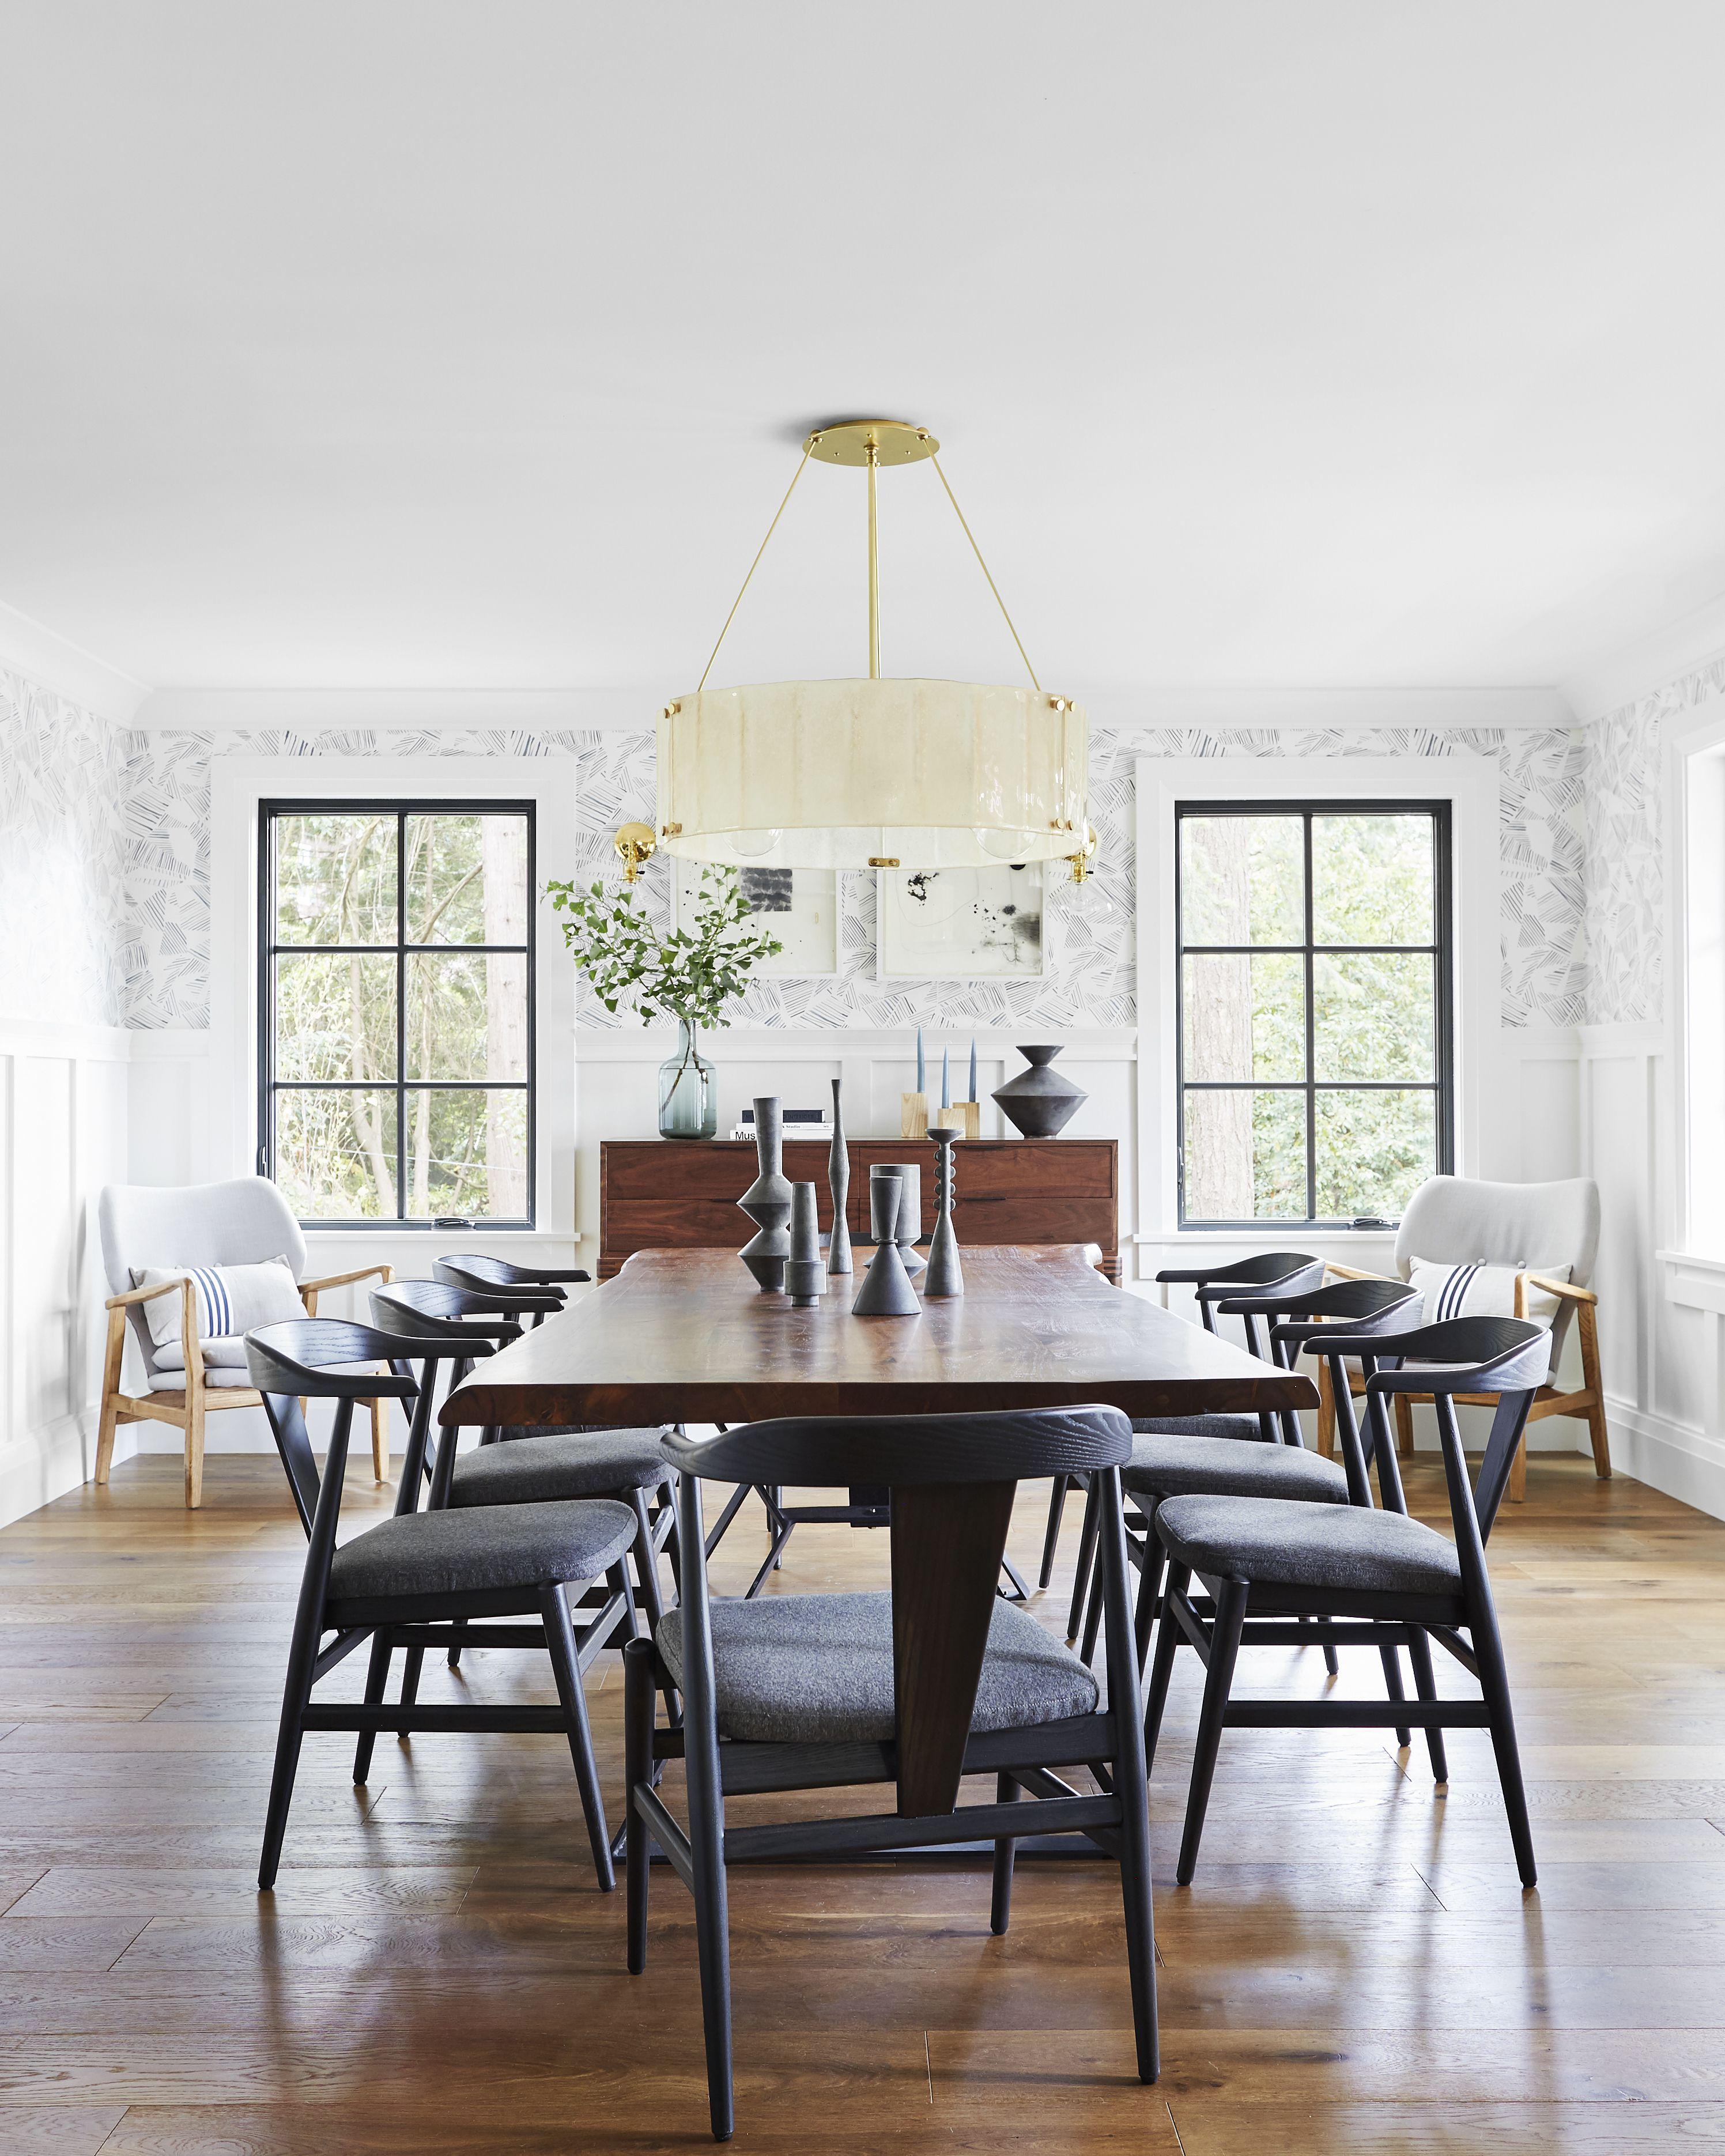 13 dining room lighting ideas to